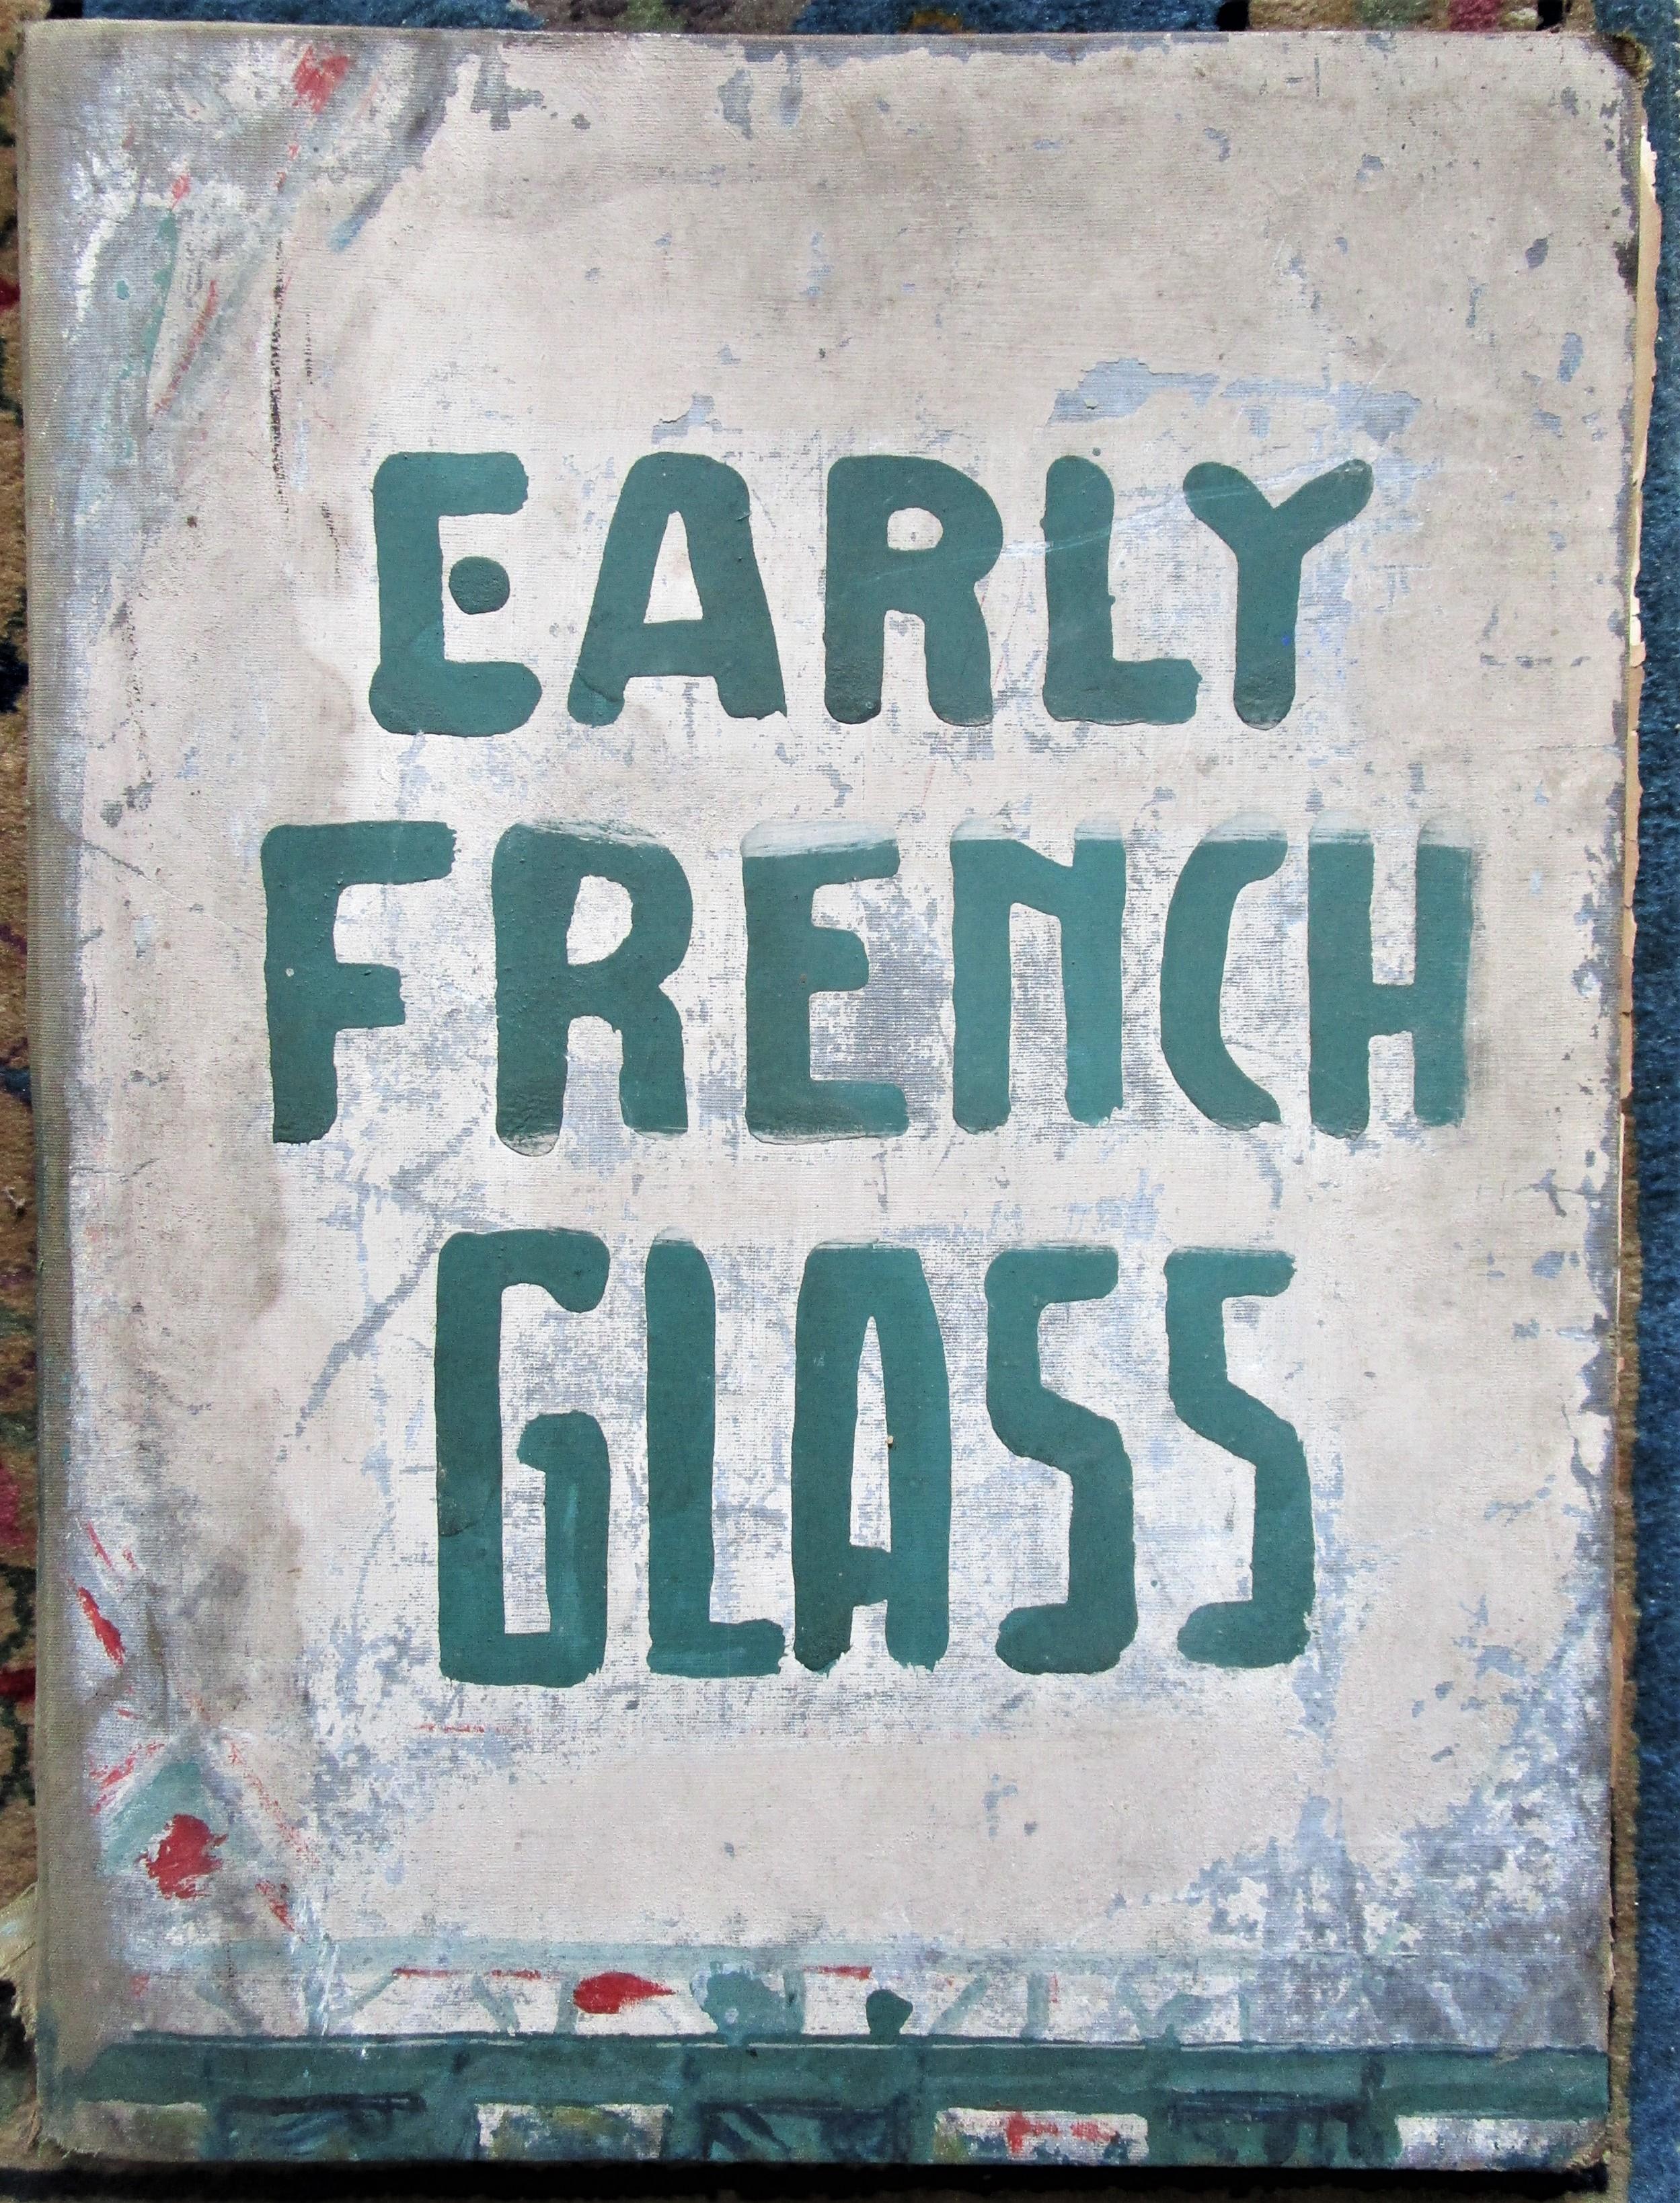 EARLY FRENCH GLASS, by M. Eugene Hucher - 1865 [elephant folio]